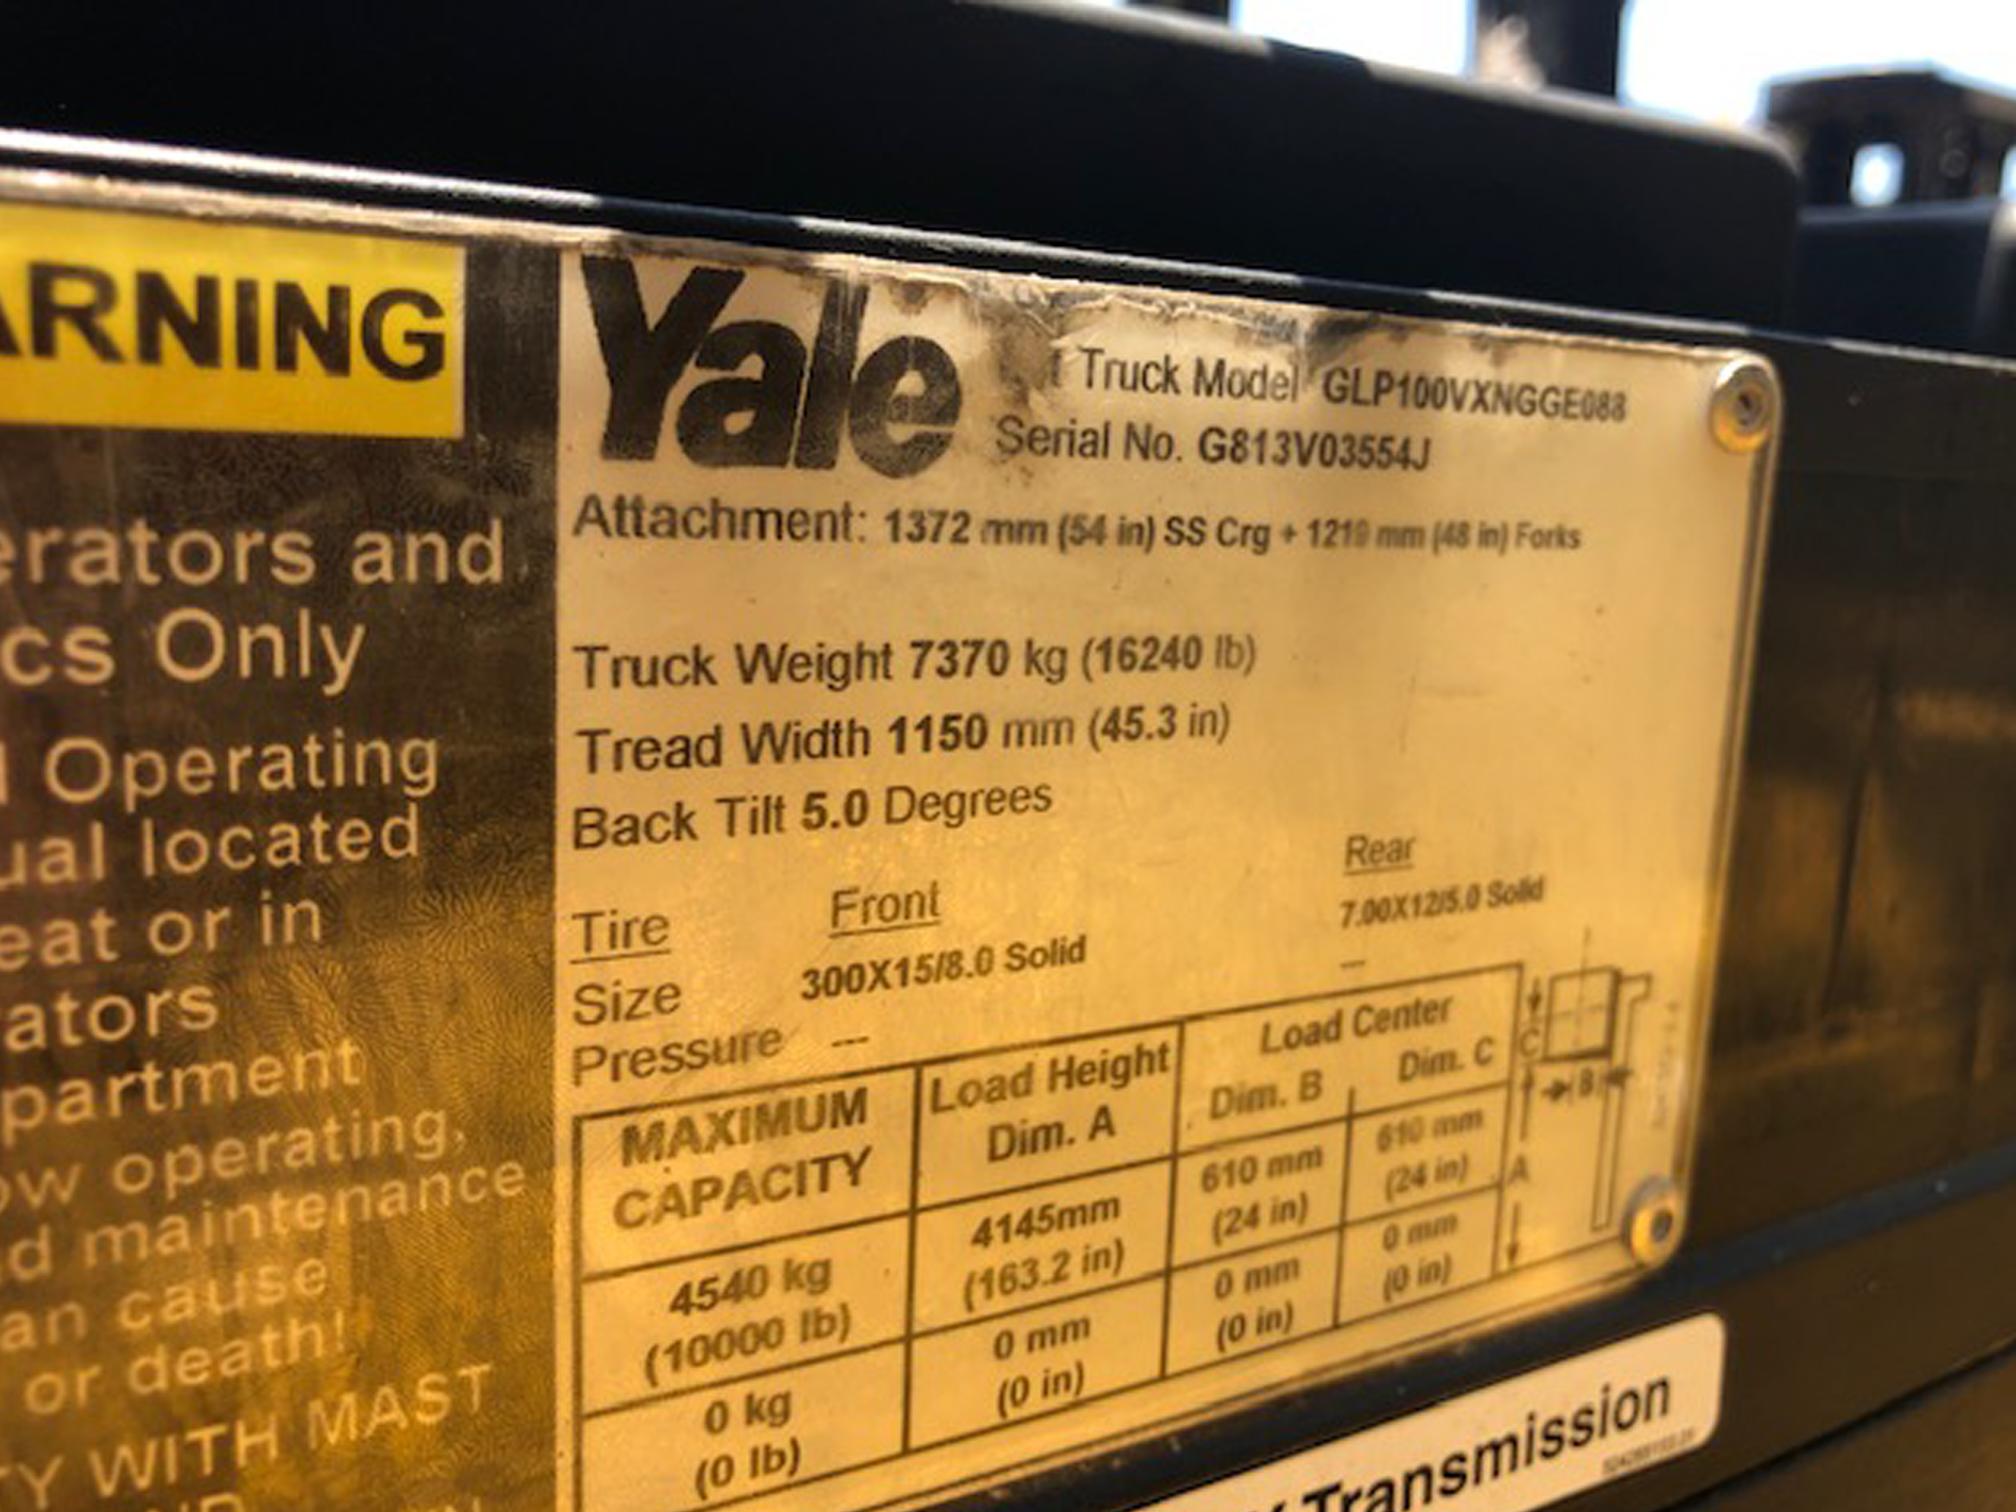 Yale 259015 information card